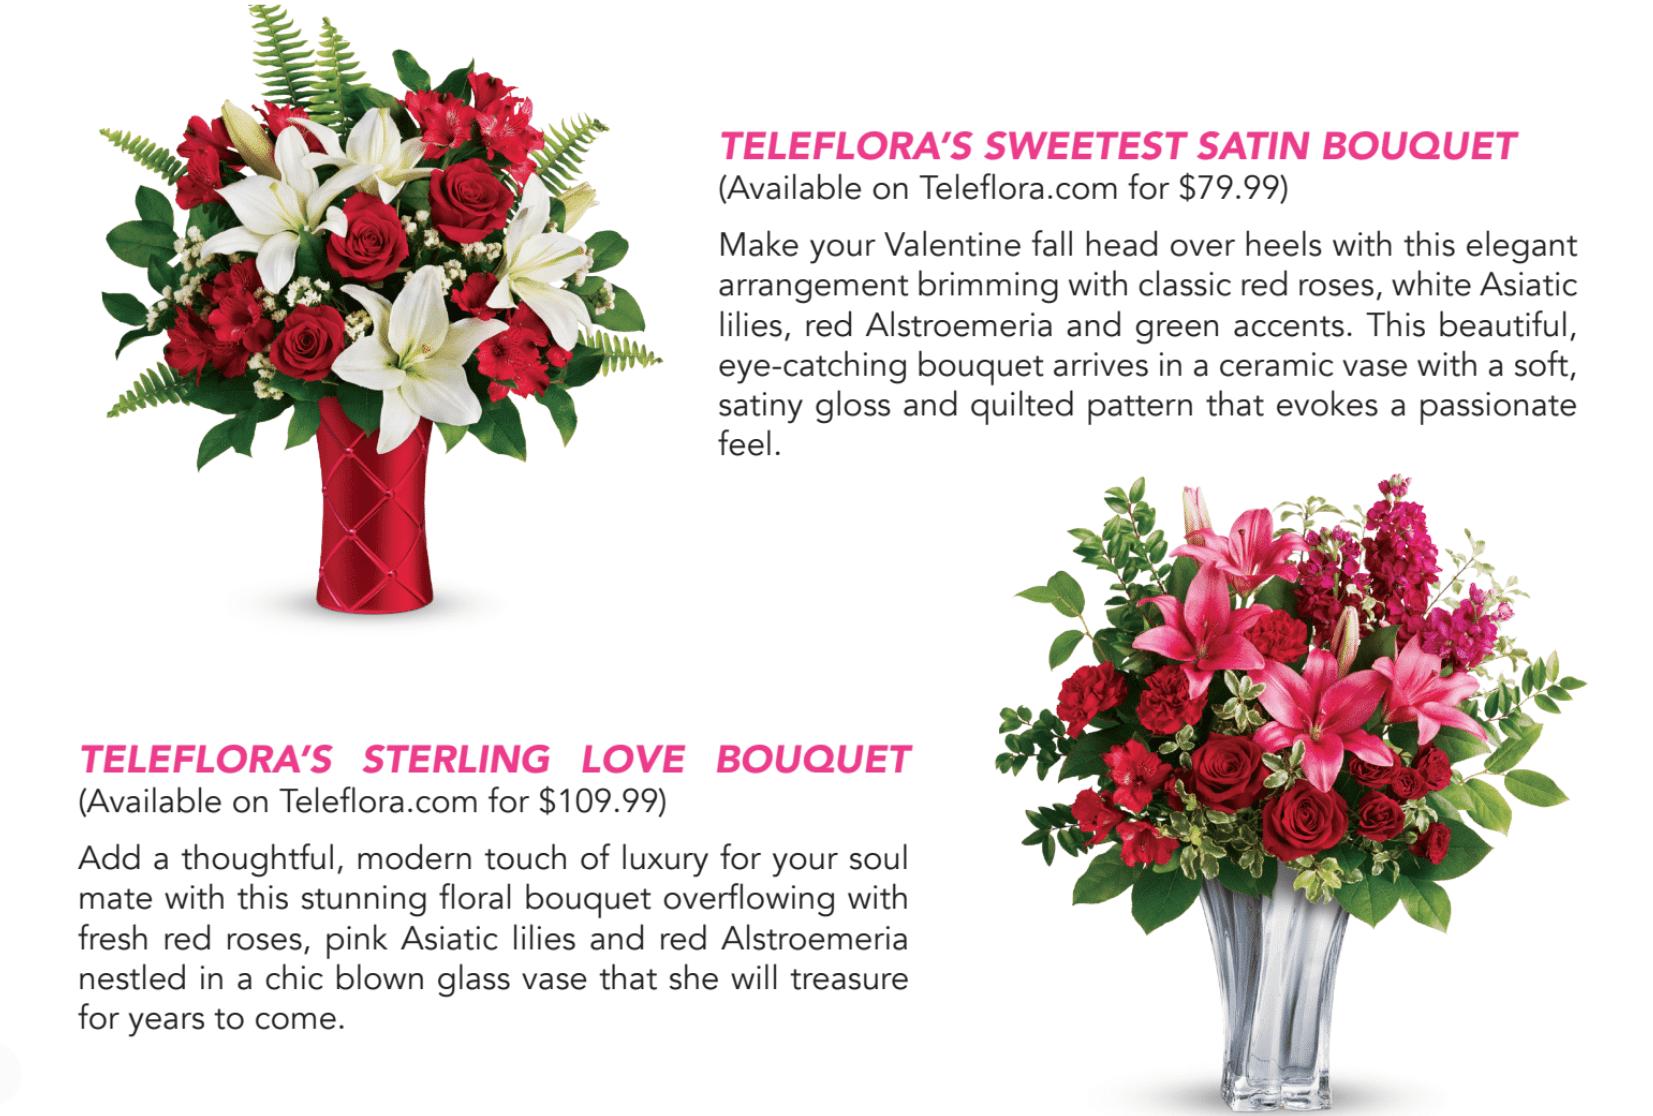 Teleflora Valentine's Day 2019 Bouquets